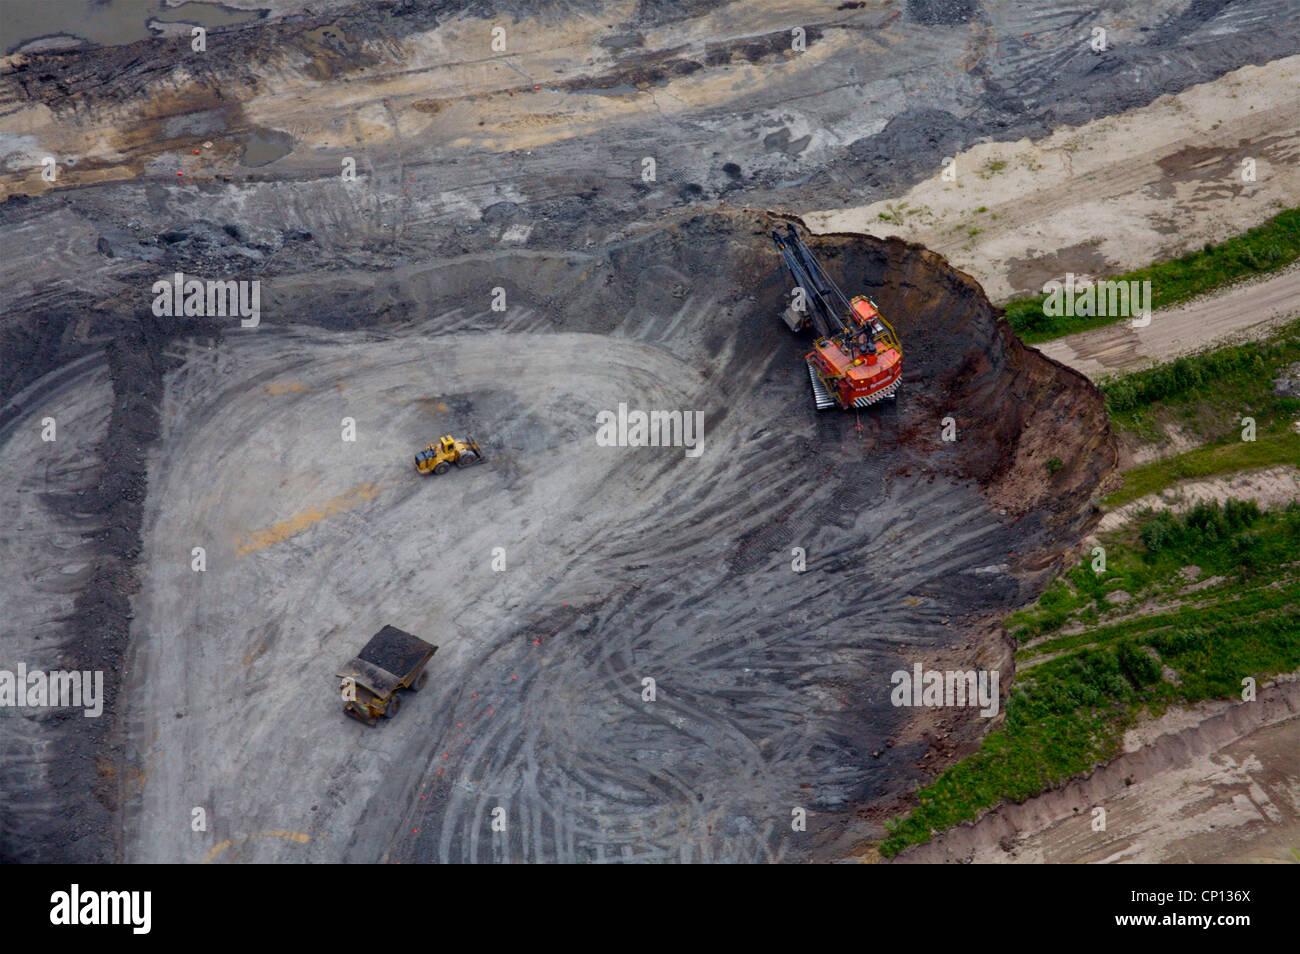 Suncor tar sands mine, Athabasca tar sands, Fort McMurray, Alberta, Canada. - Stock Image